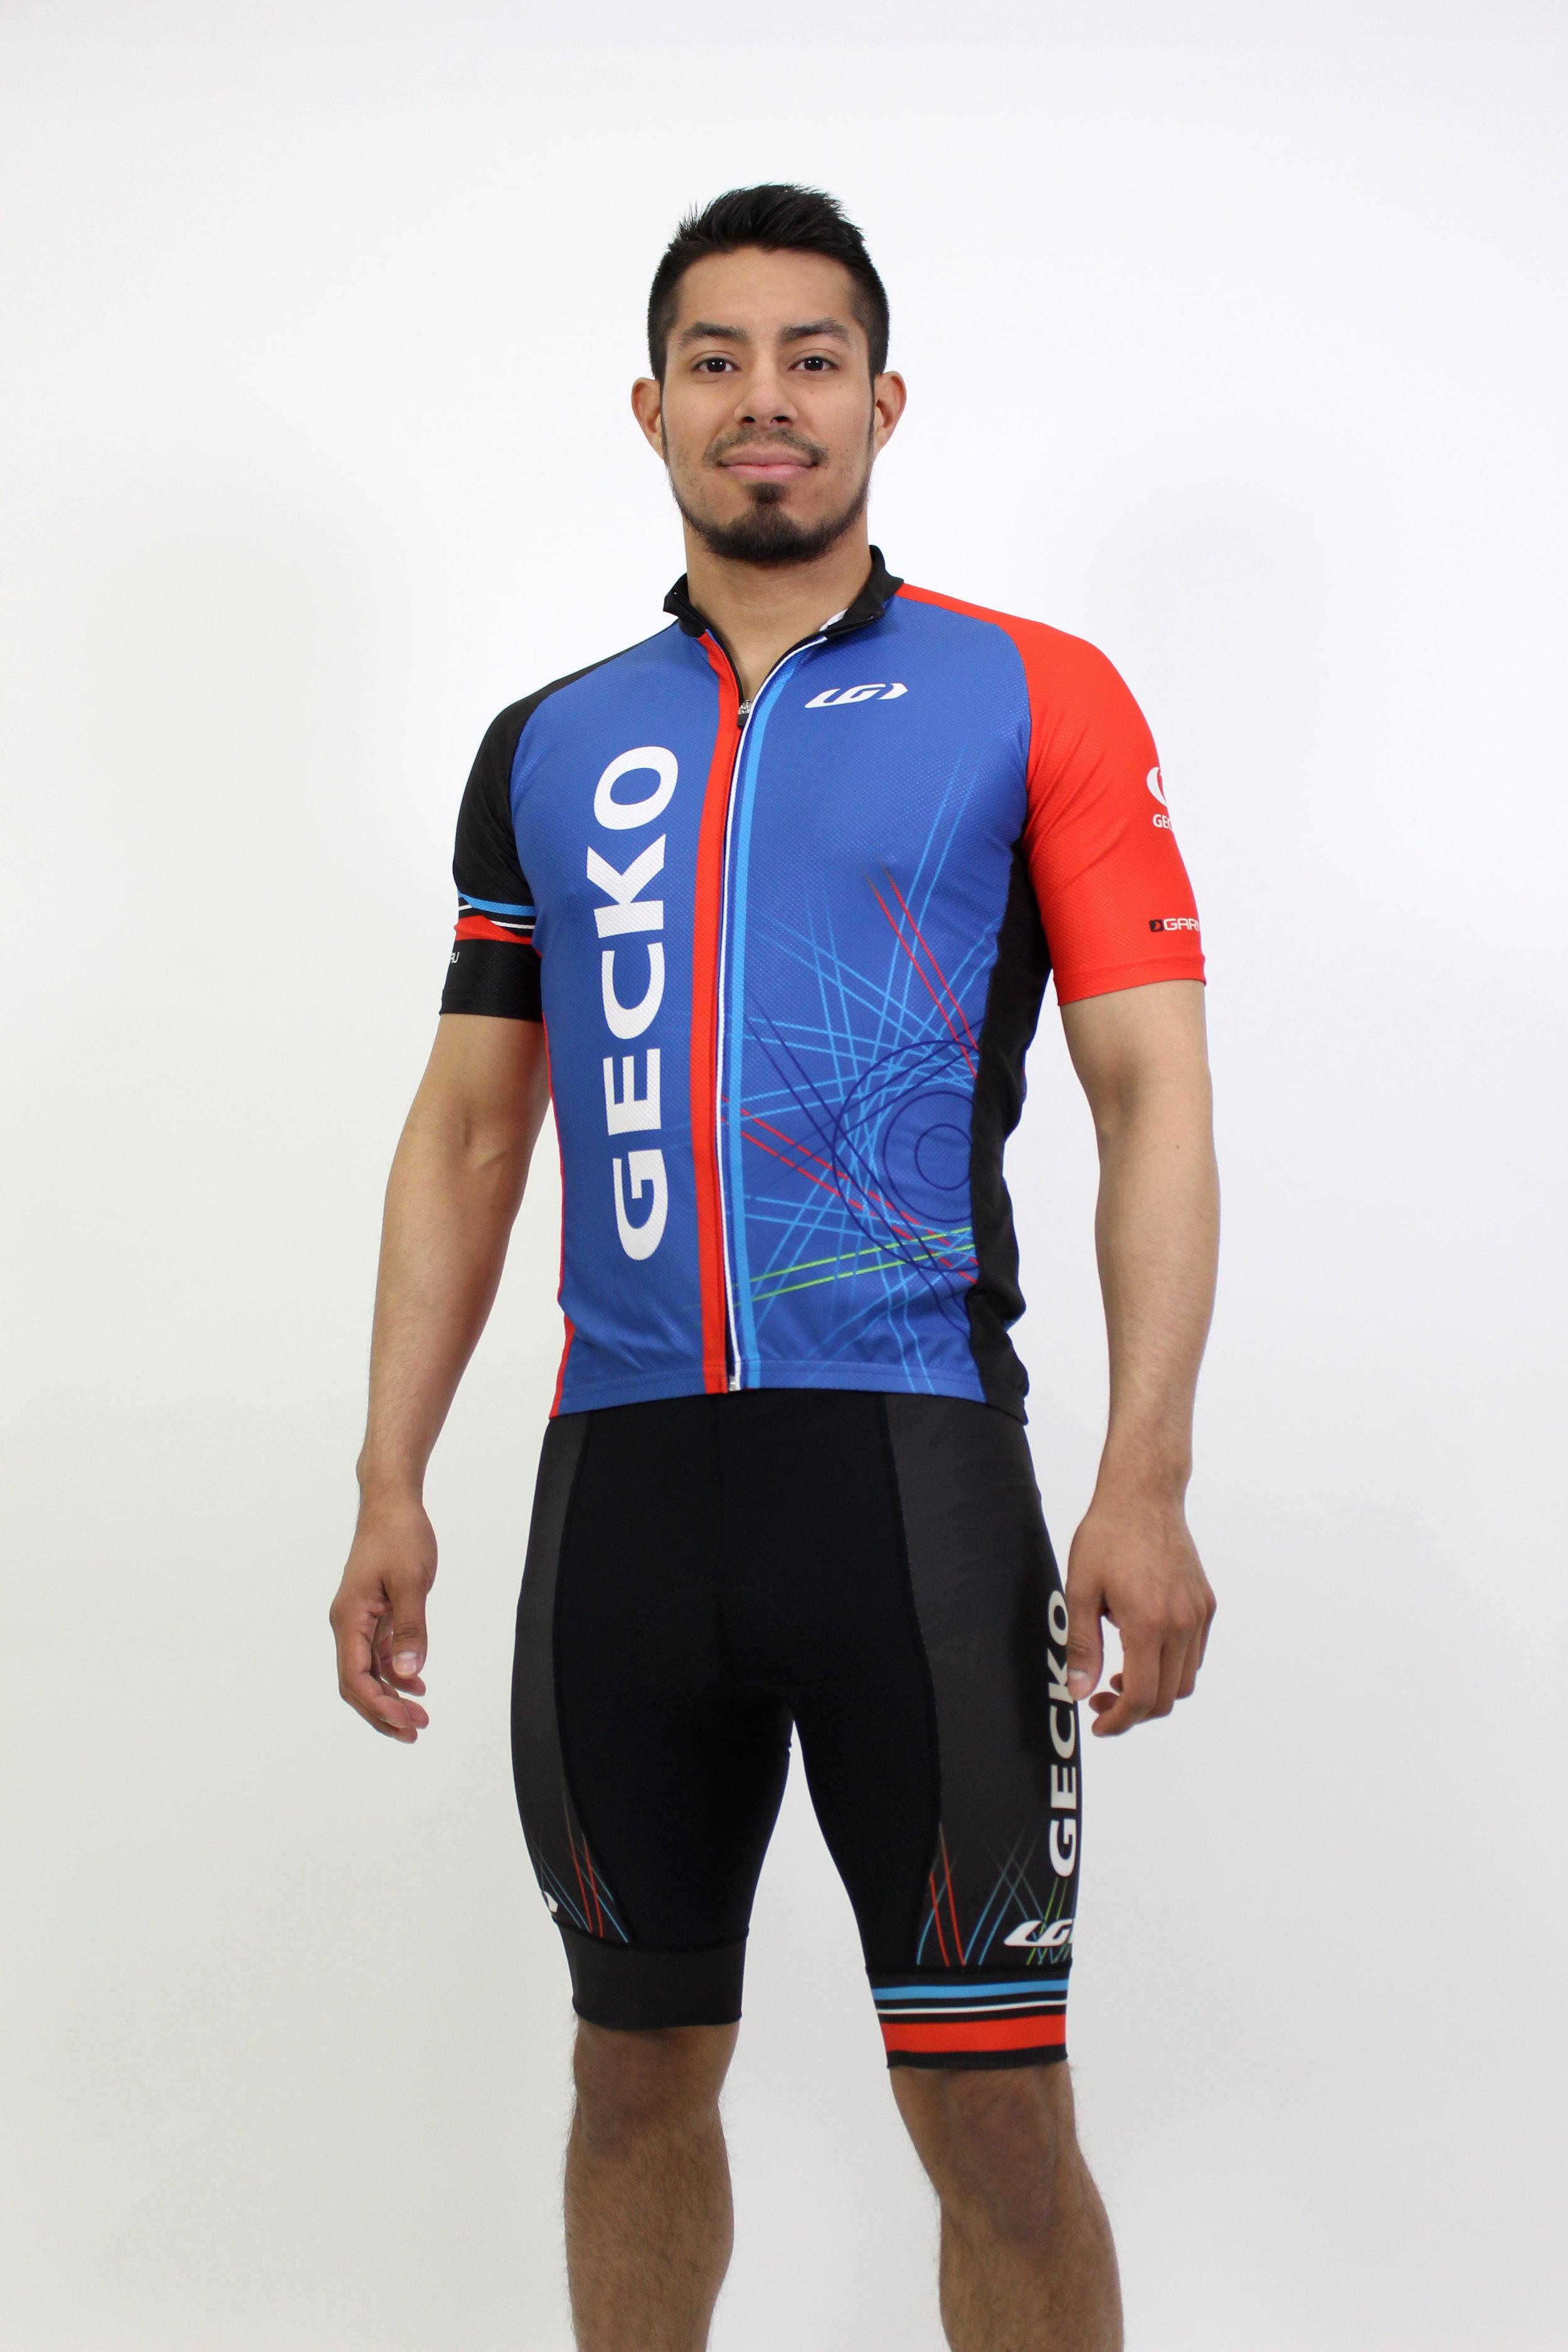 Mauricio_kit_vélo_front.jpg